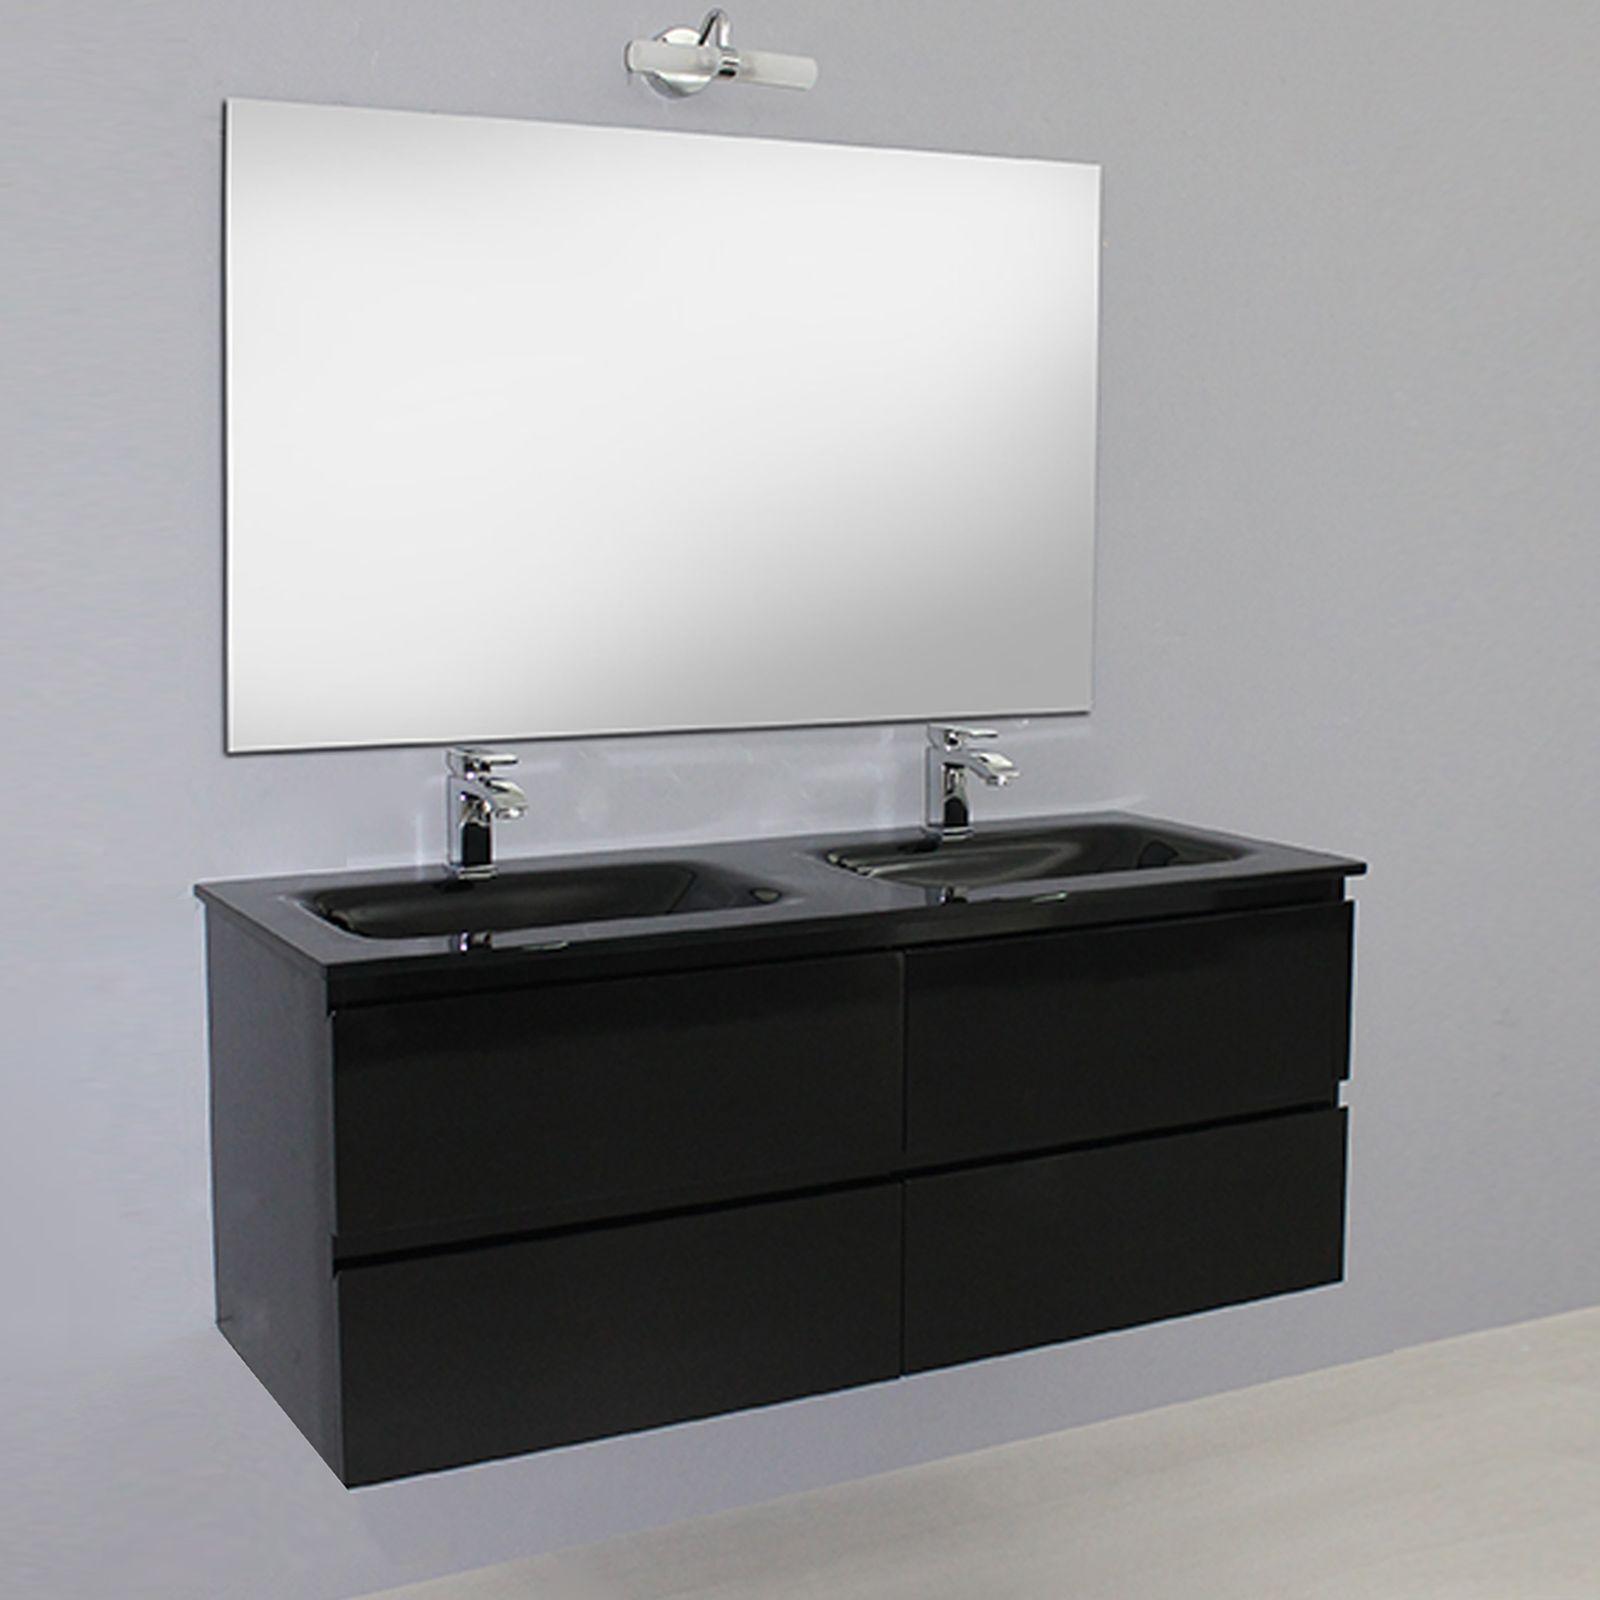 arredo bagno black, mobile moderno, doppio lavabo br - Arredo Bagno Moderno Doppio Lavabo